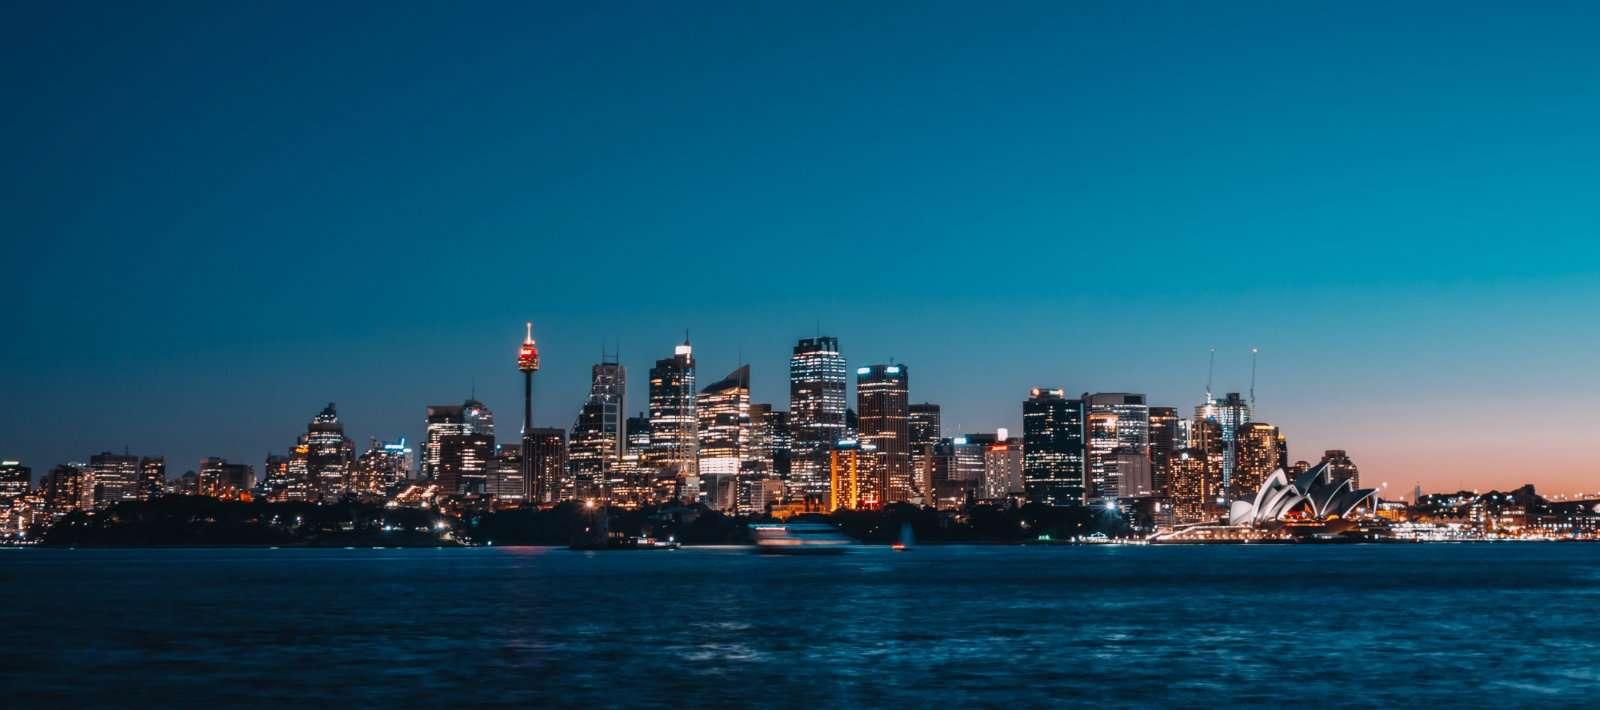 evening city bay